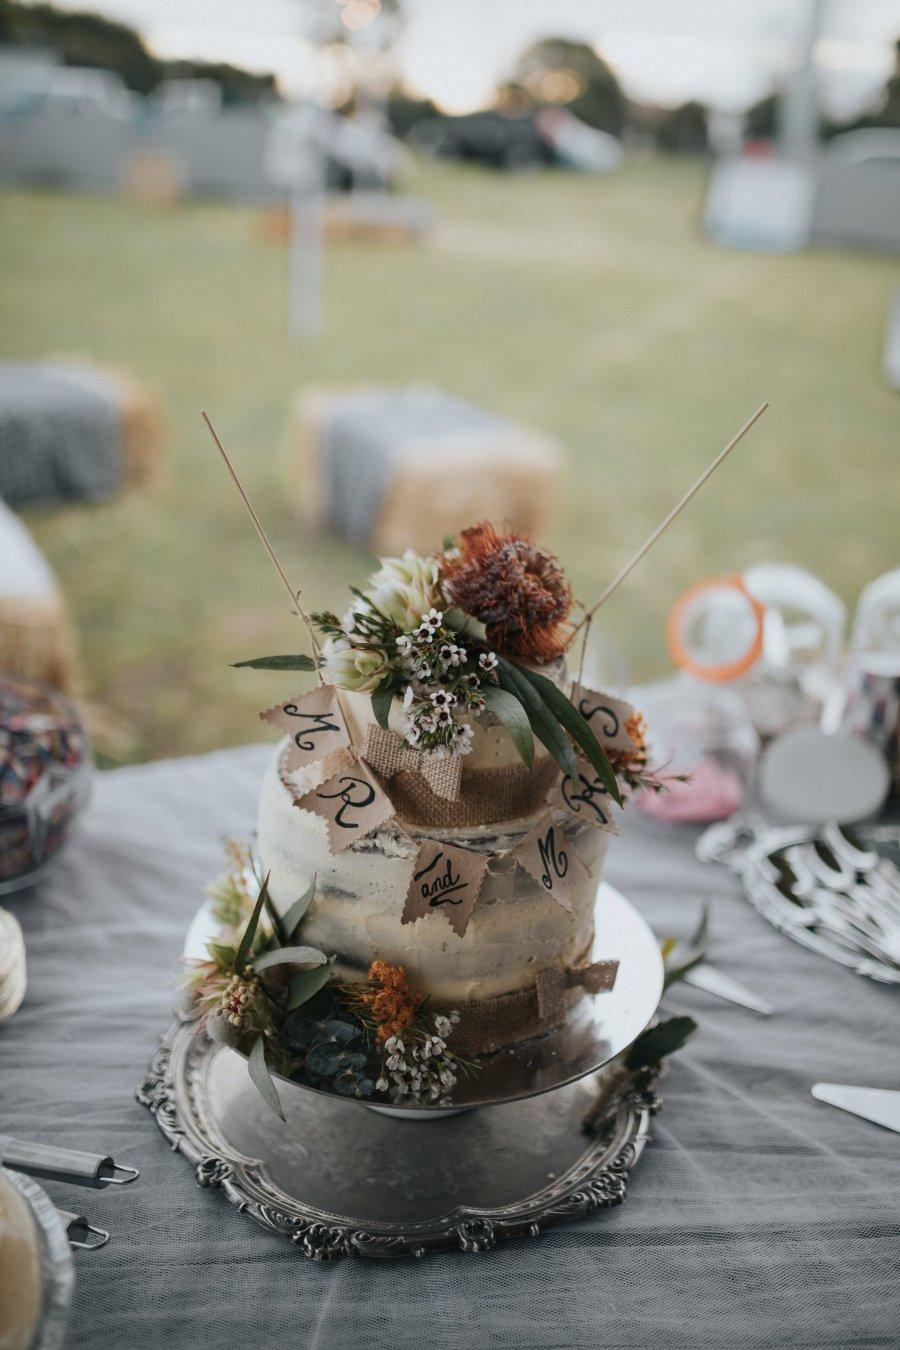 Perth Wedding Photographer | Wedding Photographers Perth | Bells Rapids Wedding | Zoe Theaidore Photography | Ebony Blush Photography | M+K640